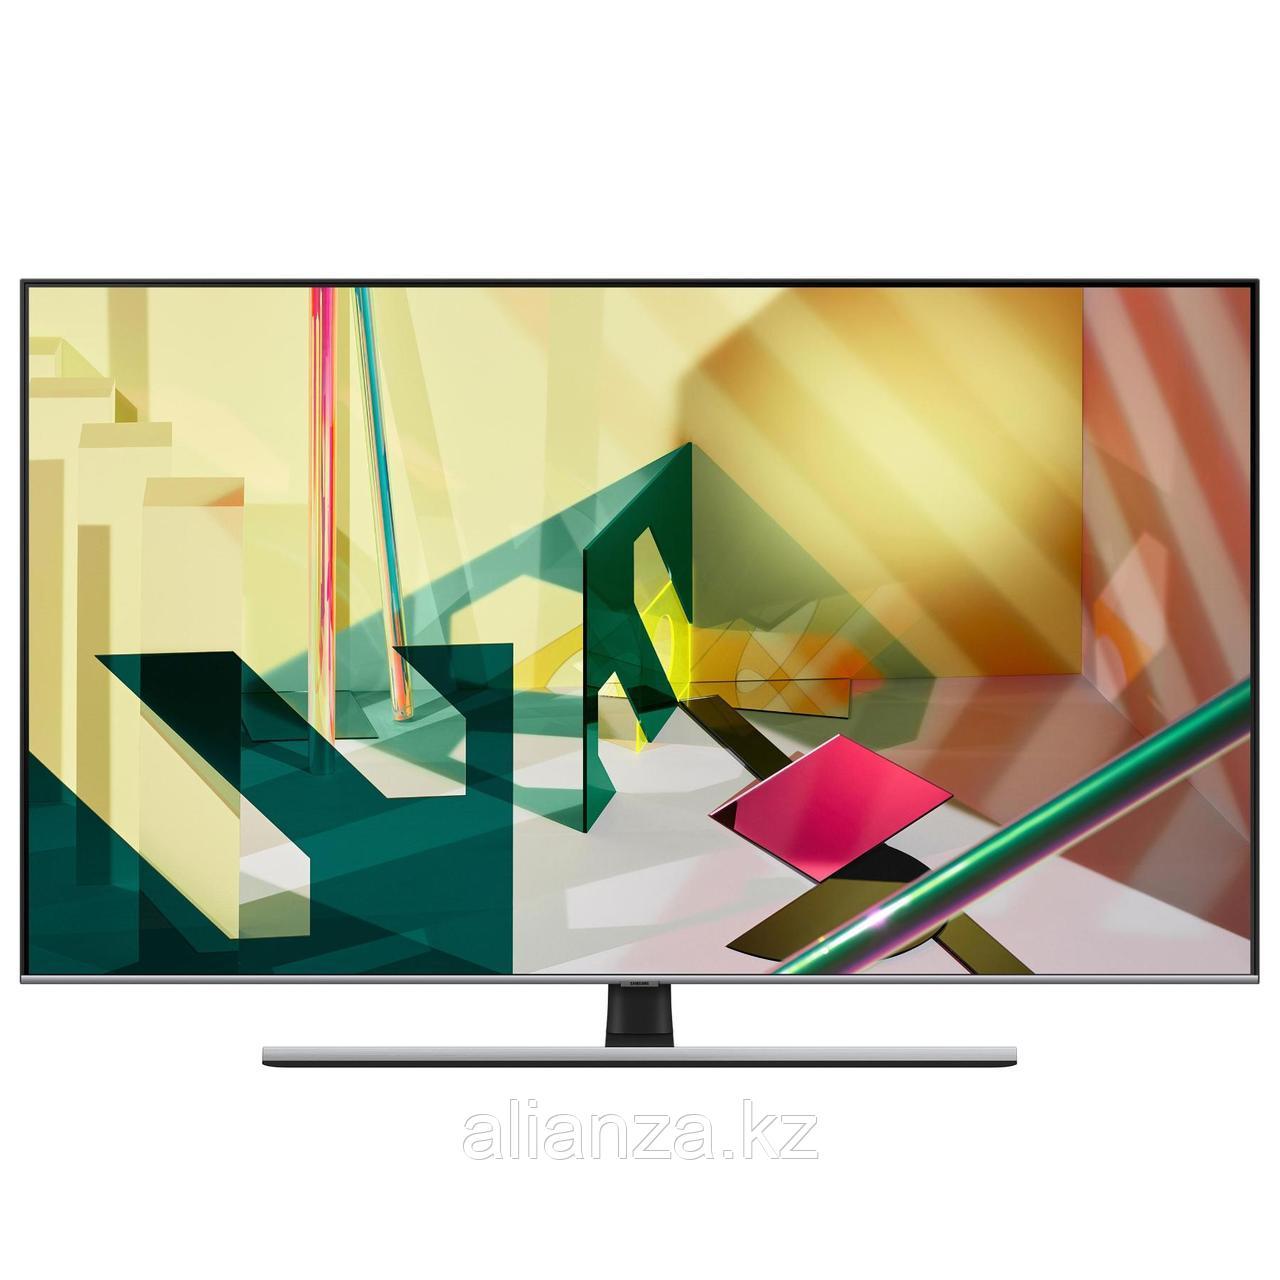 QLED телевизор Samsung QE55Q77TAUXRU